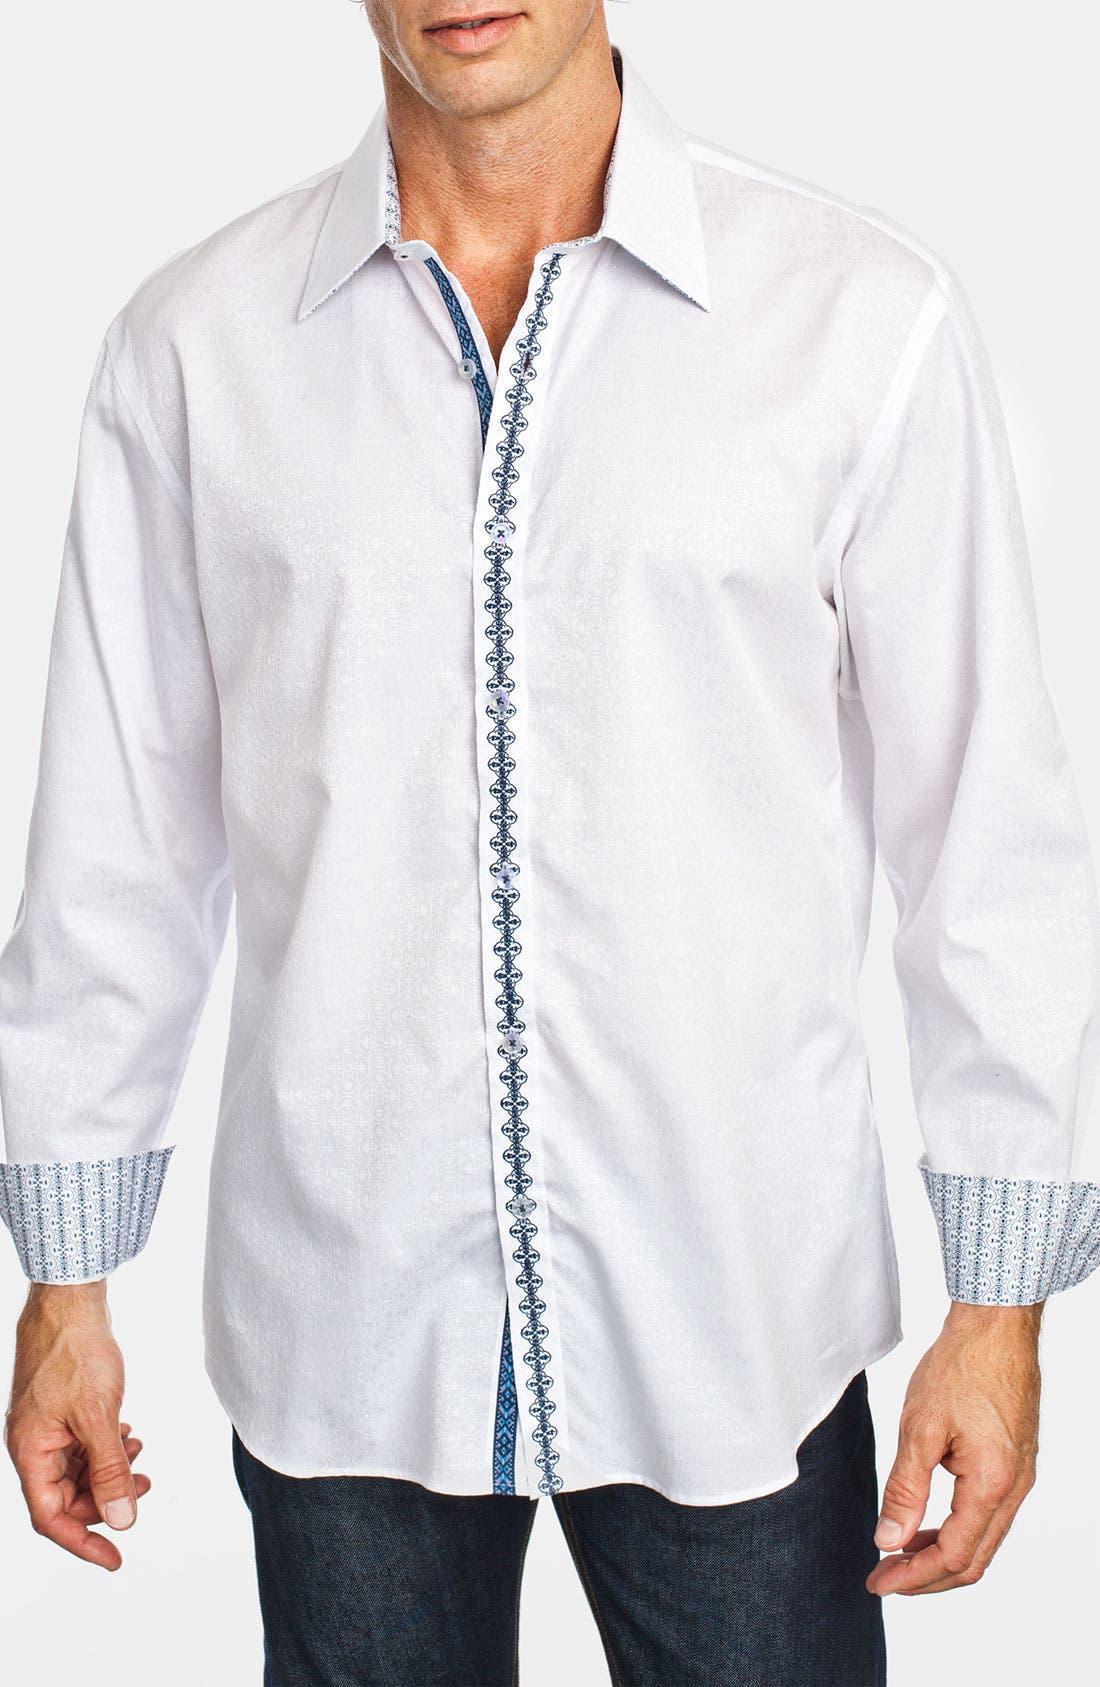 Alternate Image 1 Selected - Zagiri 'Coming Home' Sport Shirt